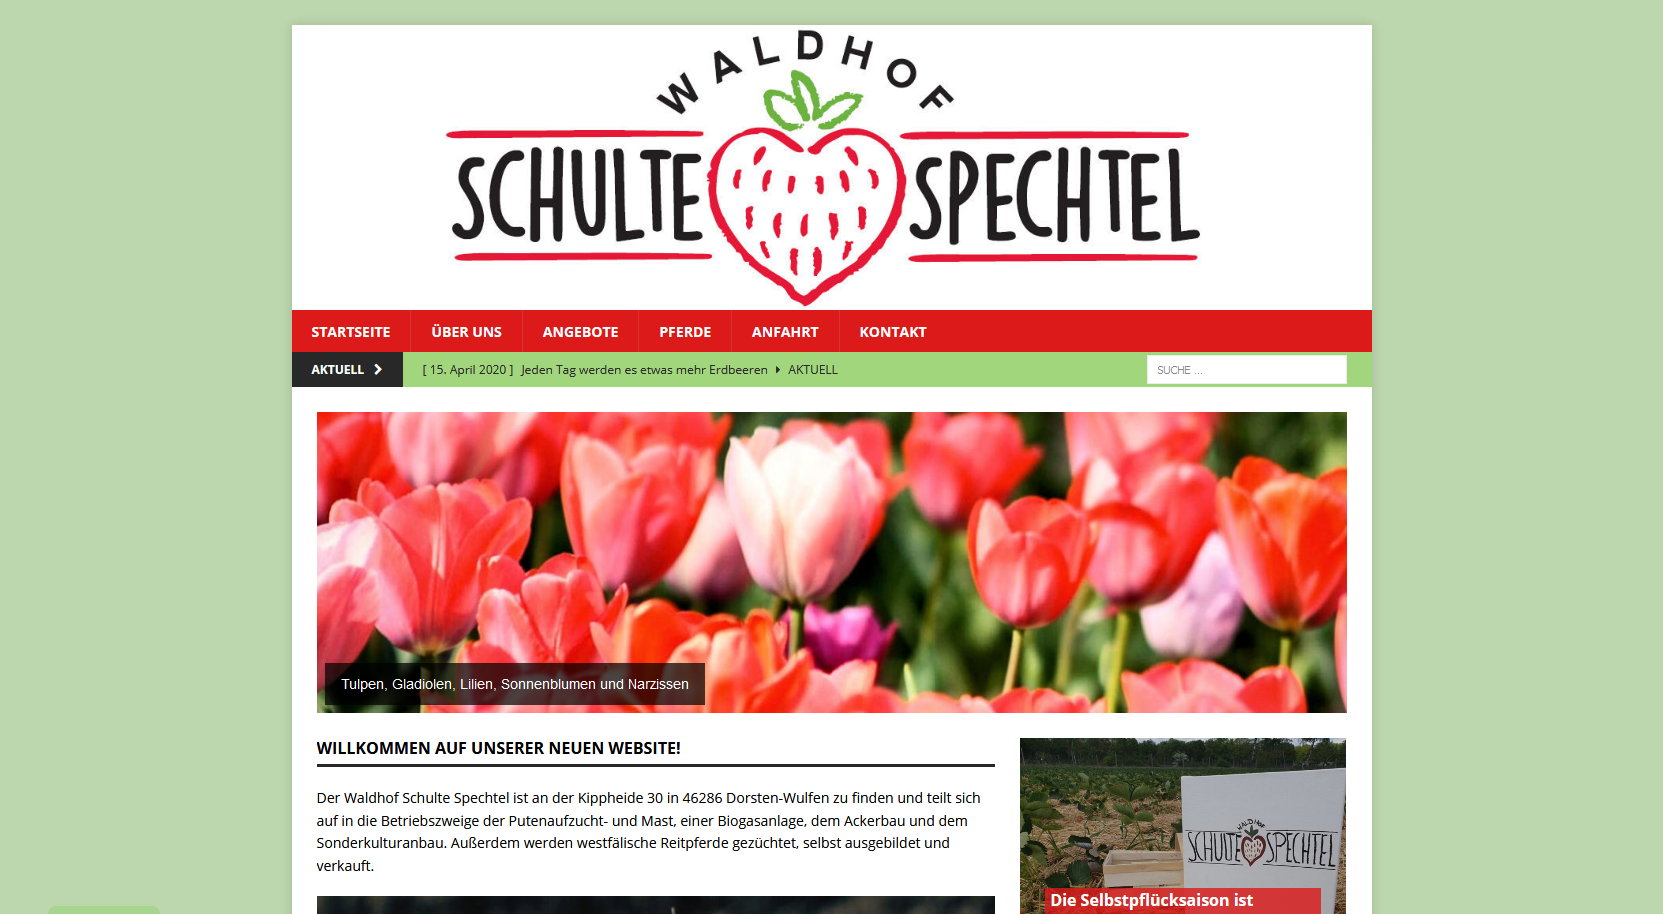 Waldhof, Schulte Spechtel, Spargel, Erdbeeren, Frisch